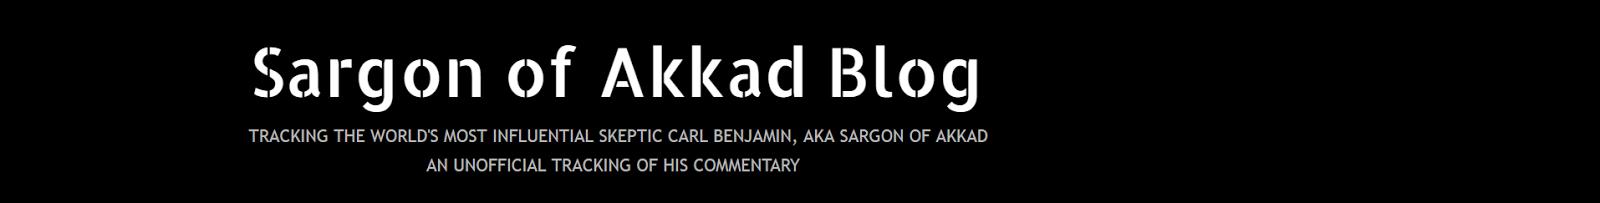 Sargon of Akkad Blog